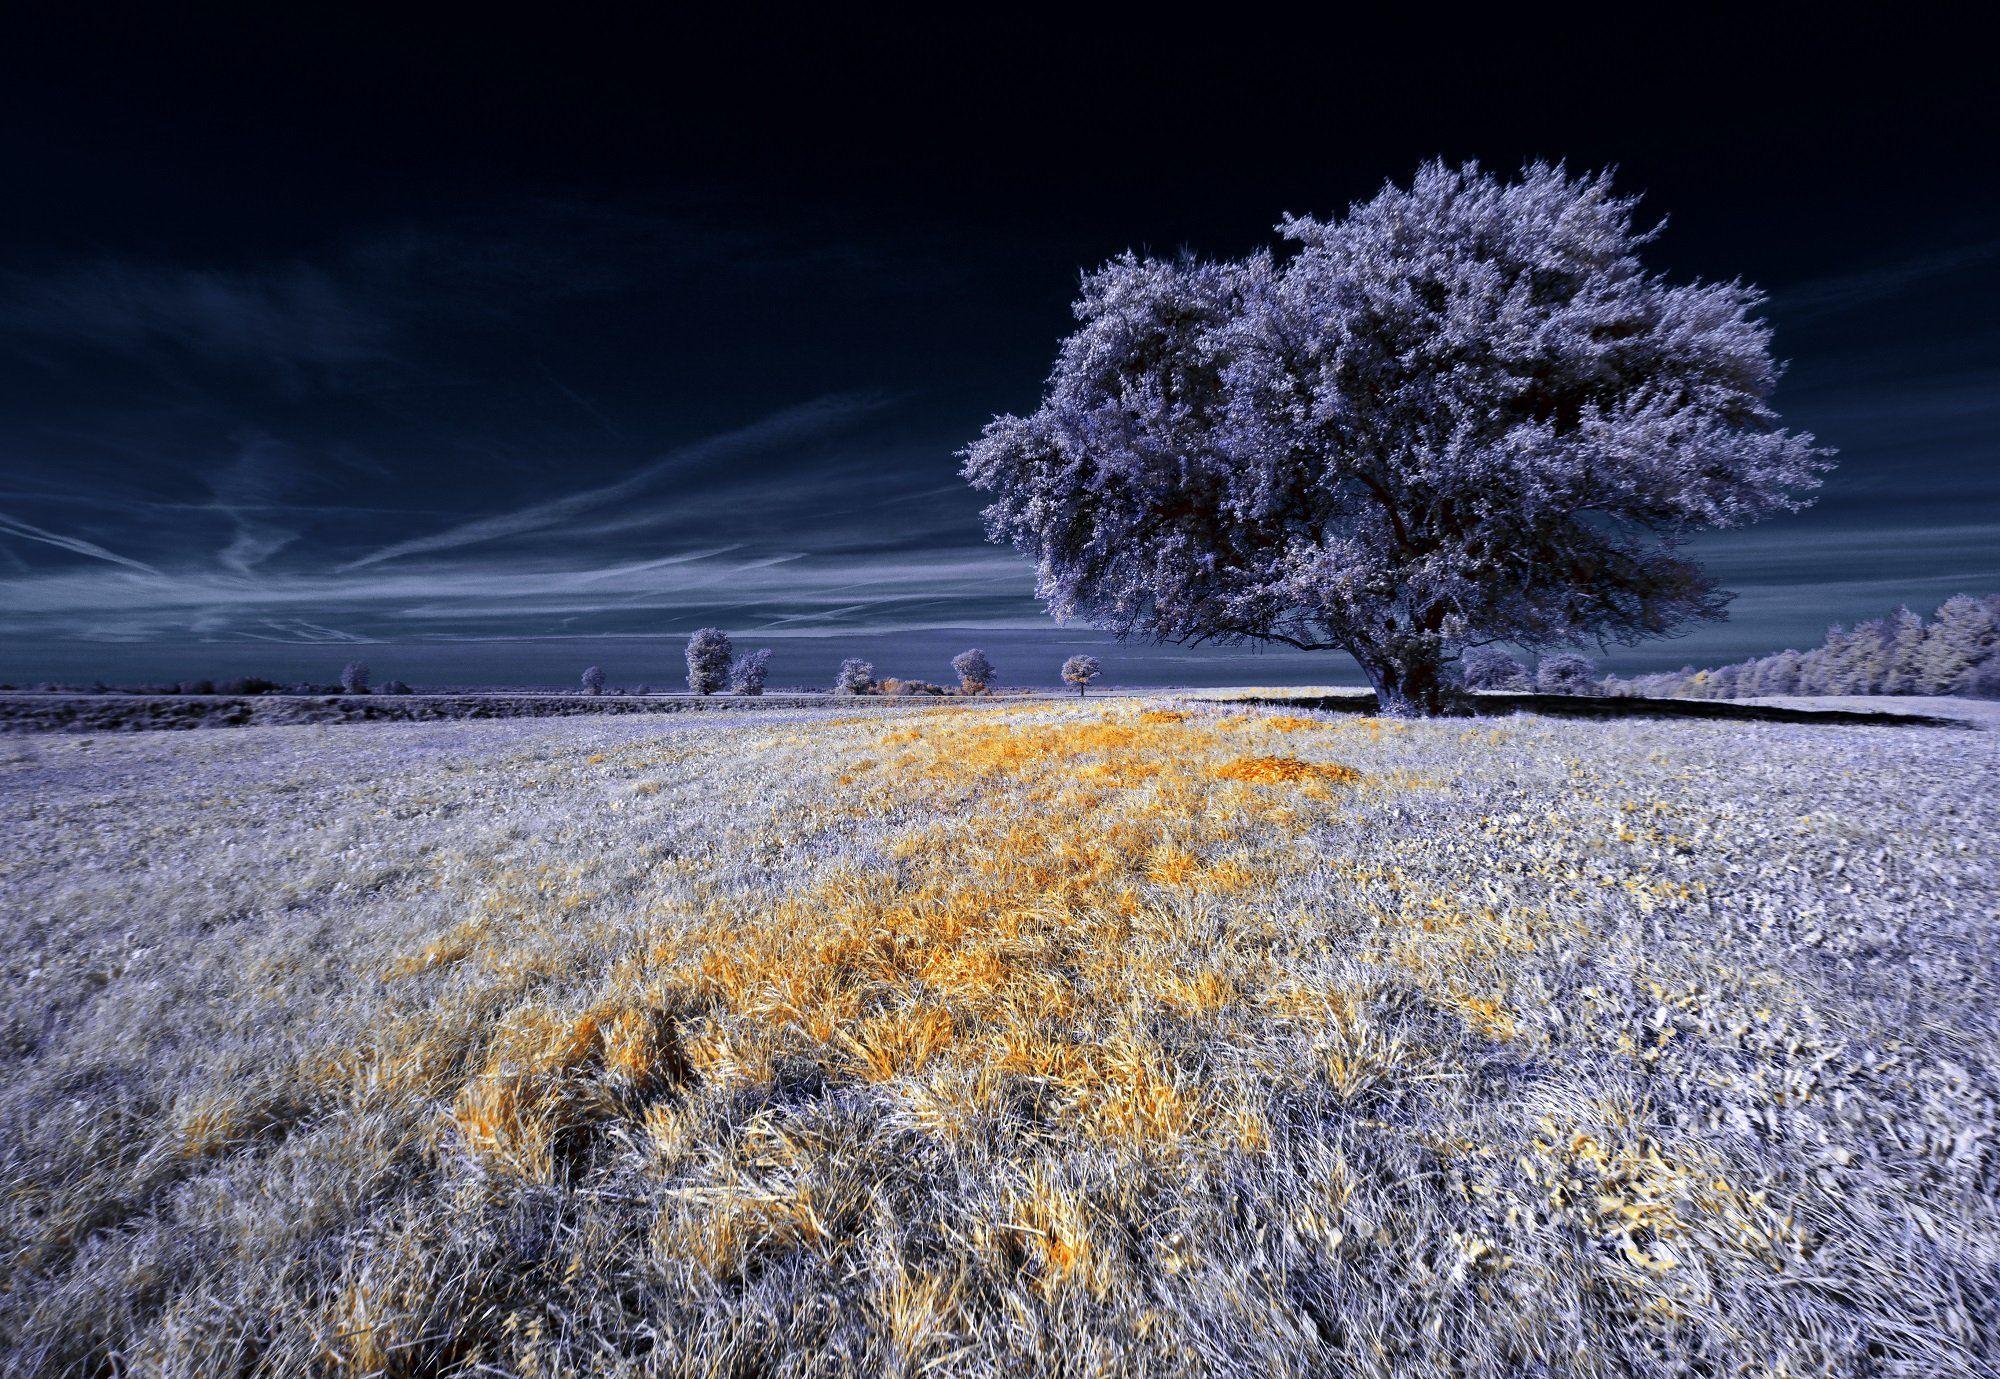 infrared,ик-фото,инфракрасное фото, инфракрасная фотография, пейзаж, осень, беларусь, Sixten ( Сергей )